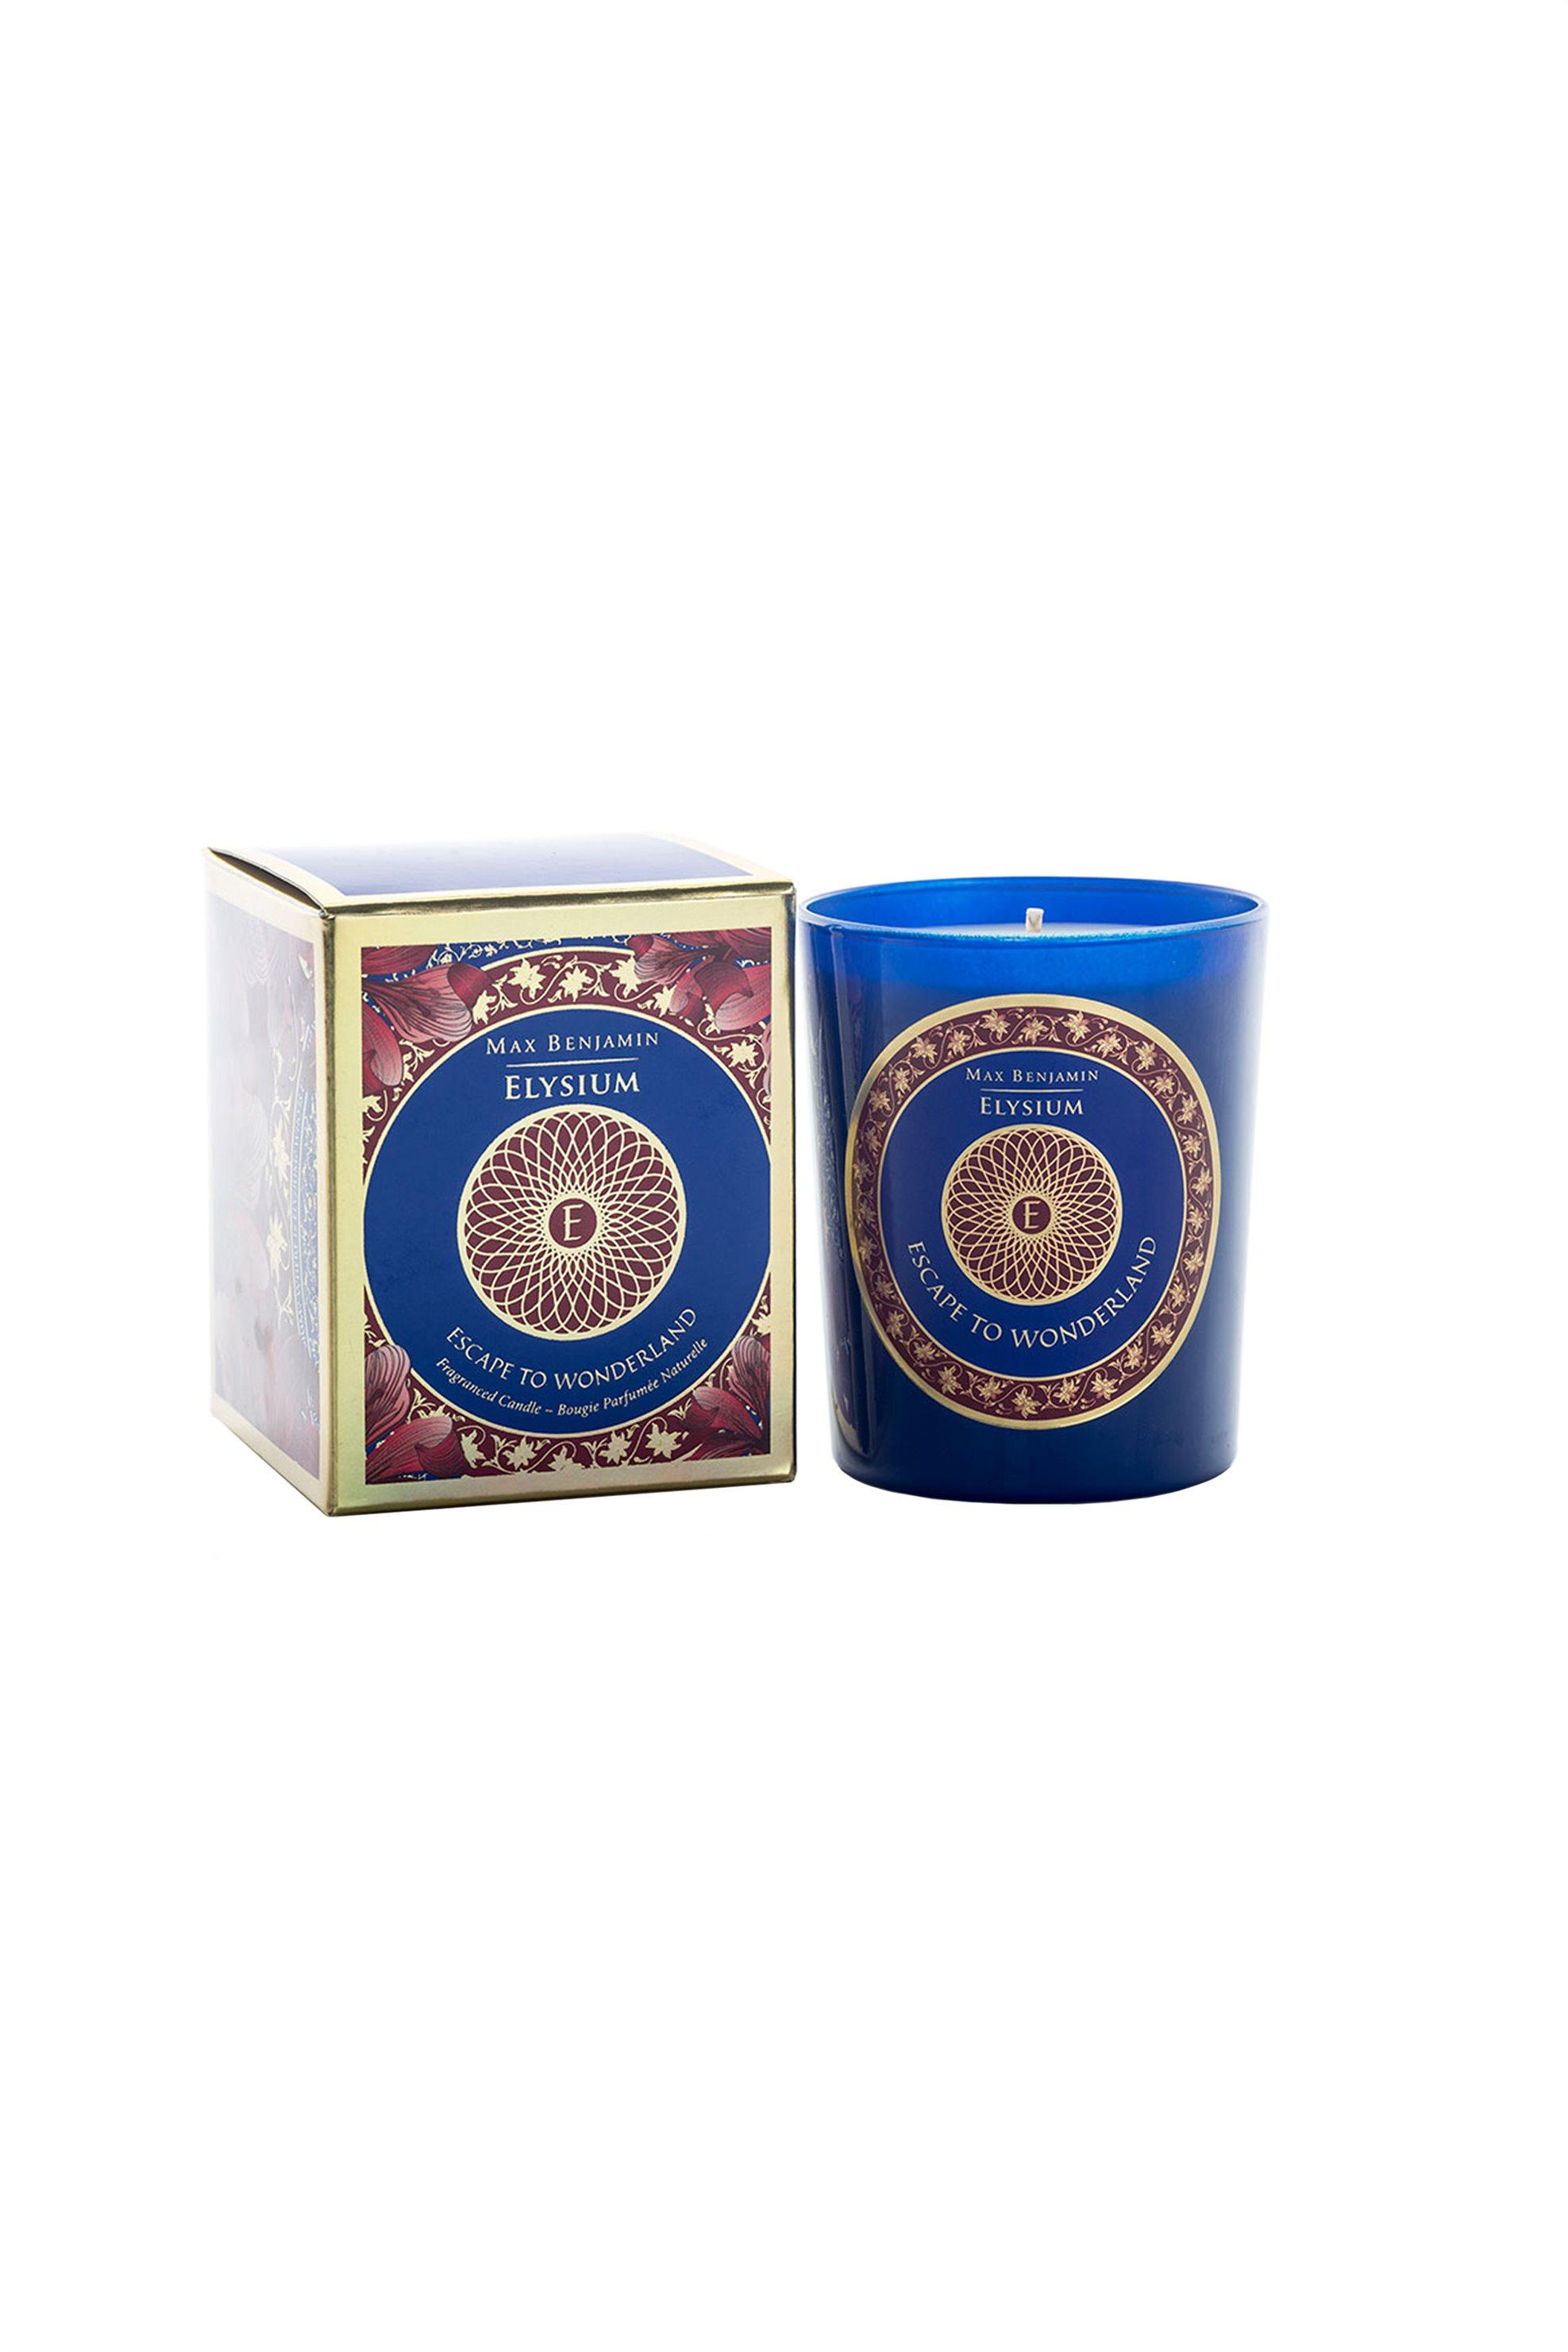 Max Benjamin αρωματικό κερί Escape to Wonderland Scented - 155-3967 home   σαλονι   αρωματικά χώρου